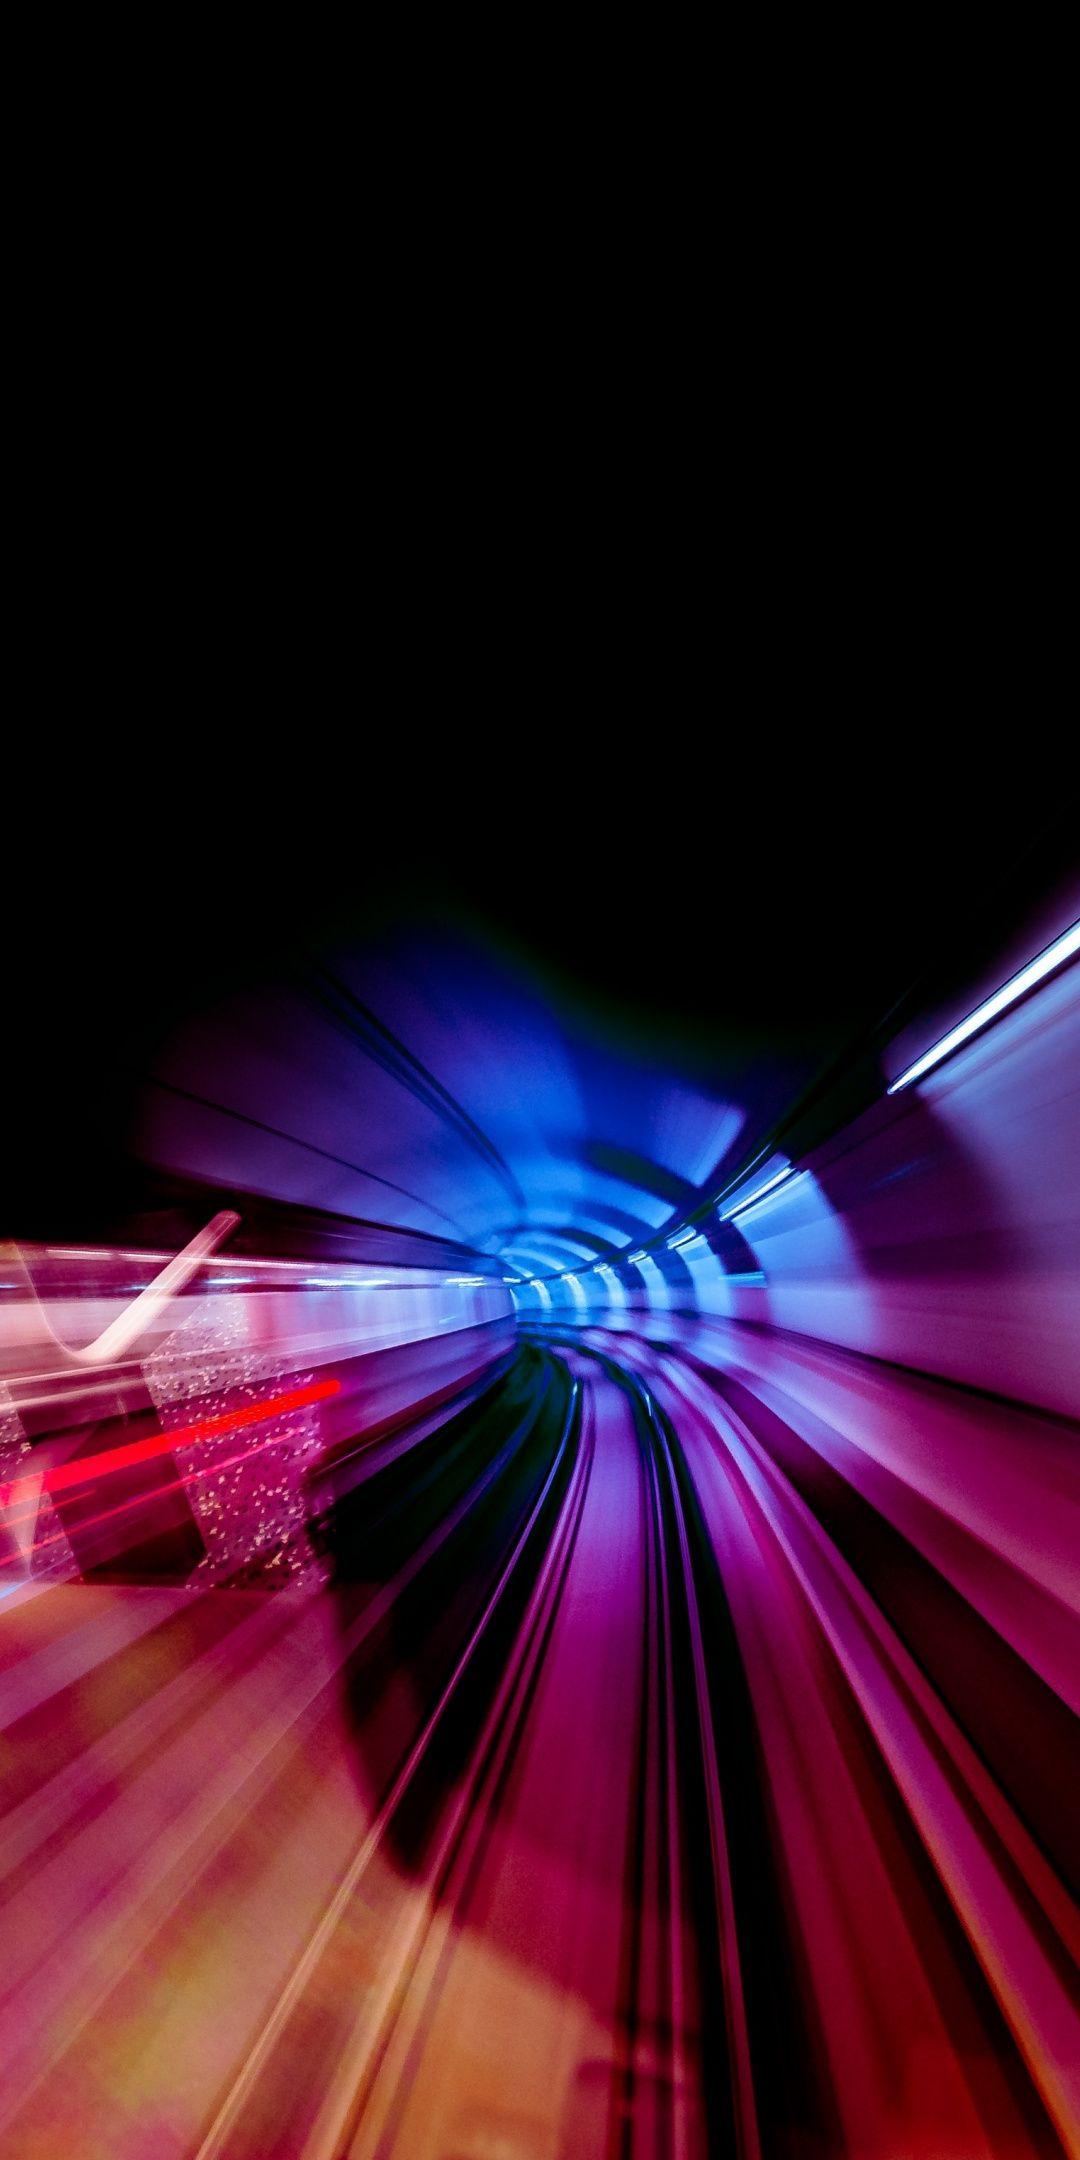 Tunnel Turn Motion Blur Backlight 1080x2160 Wallpaper Iphone Wallpaper Blur Technology Wallpaper Wallpaper